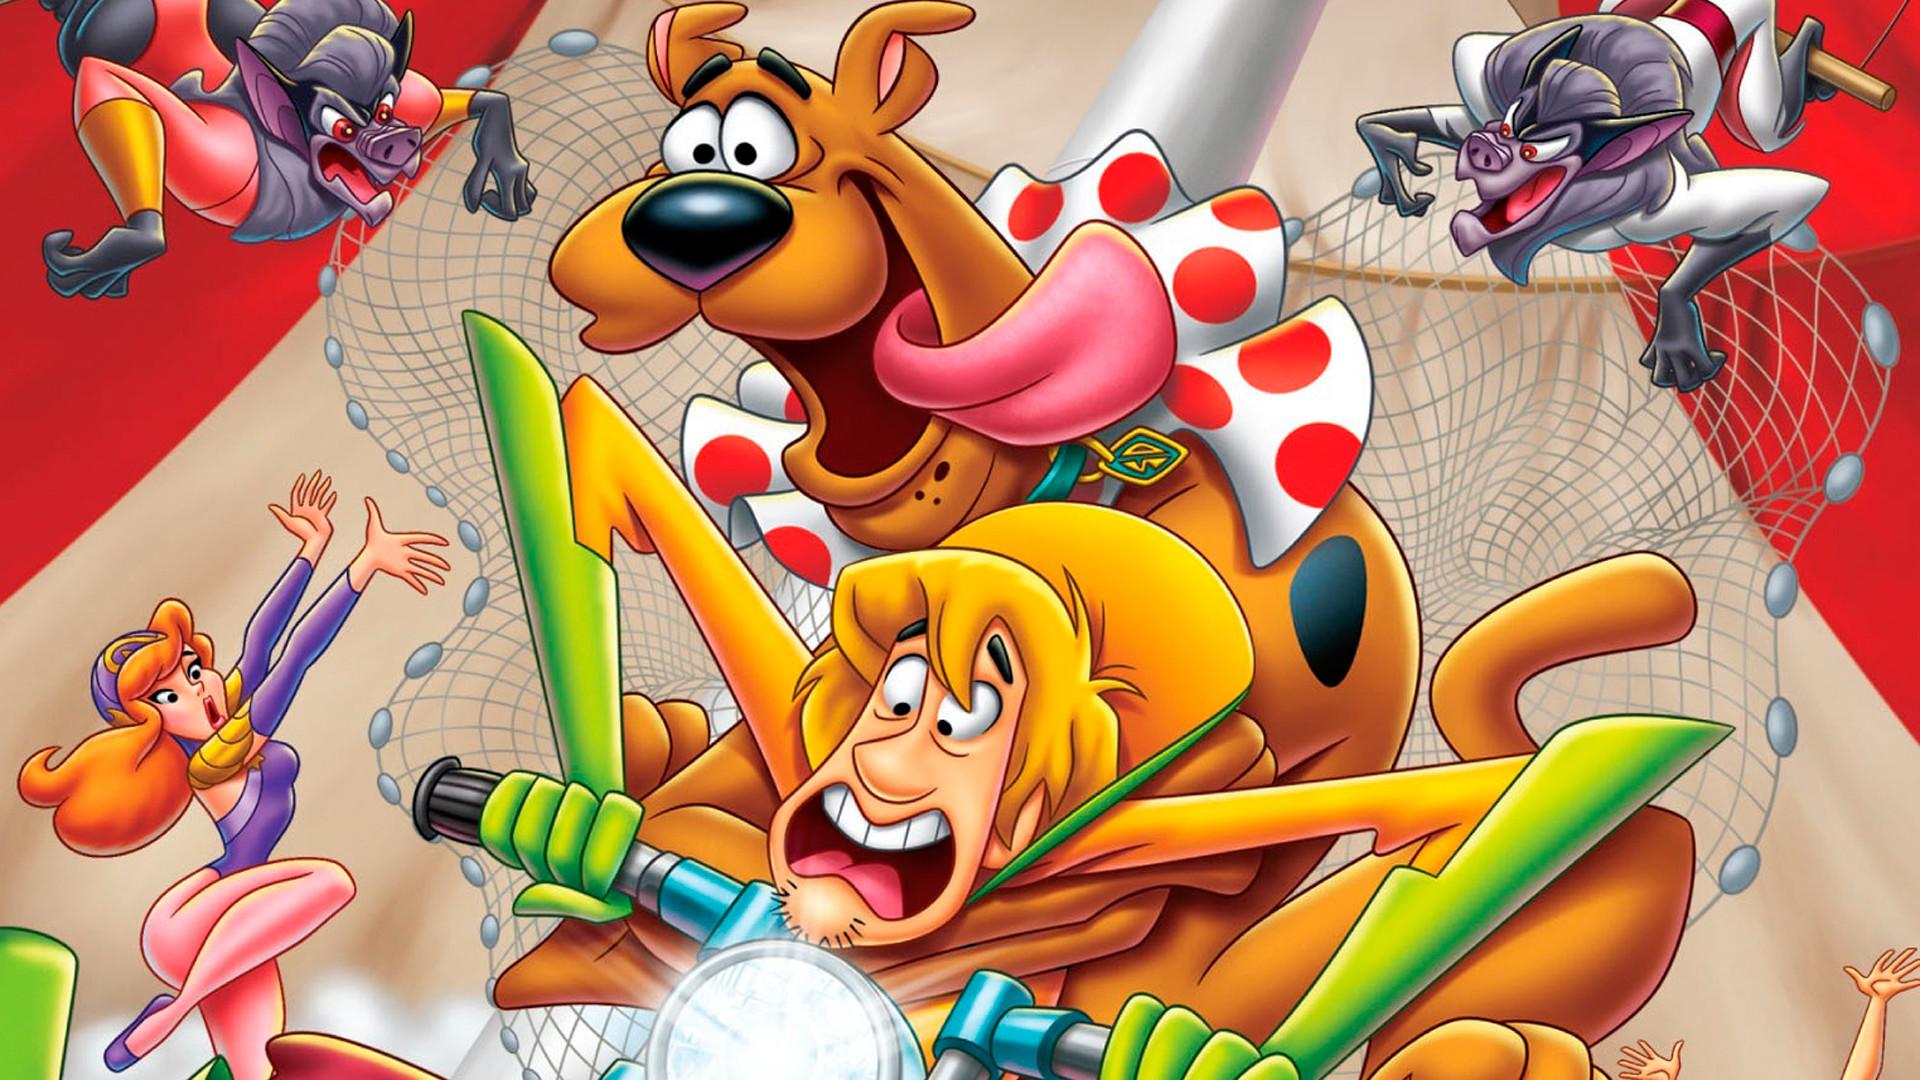 Scooby Doo Wallpapers ·① WallpaperTag